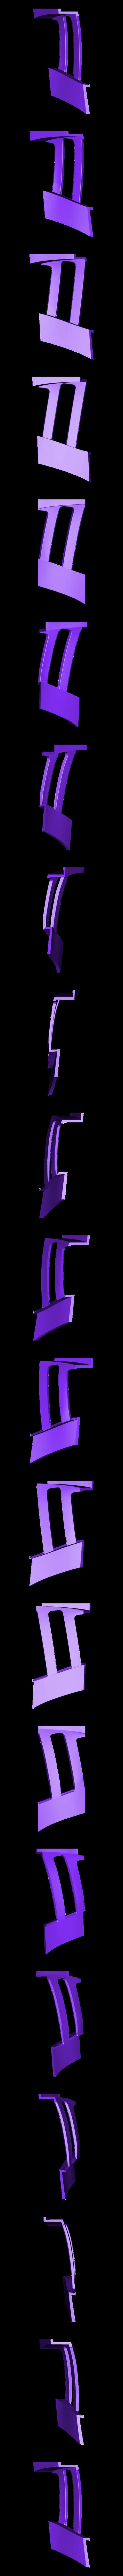 Part_4_v2_5.stl Download free STL file  Iron Musketeer's Helmet (Final Fantasy XI) • 3D printable design, VillainousPropShop